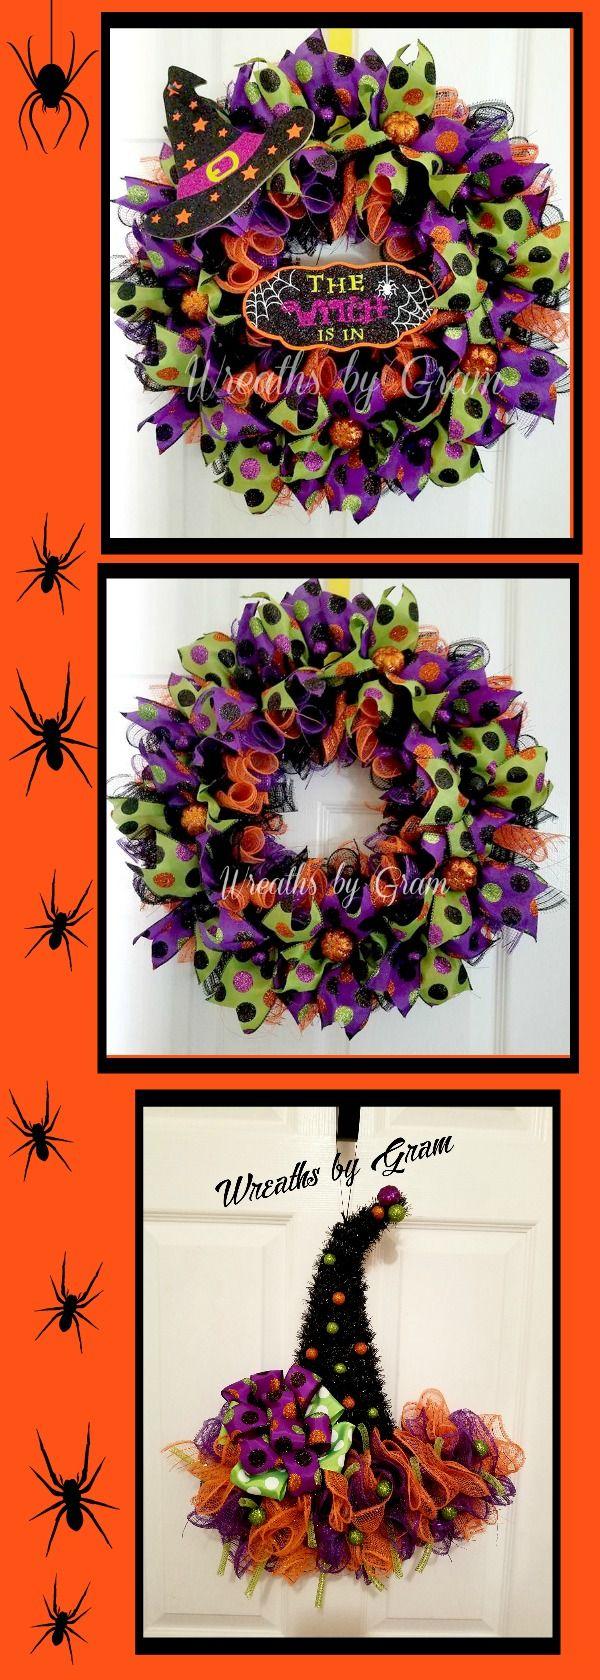 Witch Hat Wreath | Witches Hat Door Hanger | Halloween Decor | Halloween Wreath | Mesh Witch Hat | Whimsical Decor | Front Door Wreath | Witch Hat Decorations | Witch's Hat | HALLOWEEN DECORATIONS; HALLOWEEN PARTY; HALLOWEEN WREATHS FOR FRONT DOOR; HALLOWEEN WREATH IDEAS; FALL WREATHS; AUTUMN WREATHS; HOLIDAY WREATHS; HALLOWEEN GIFTS; HALLOWEEN IDEAS; HALLOWEEN WREATH; HALLOWEEN PUMPKINS; HALLOWEEN DECORATING; HALLOWEEN DECOR